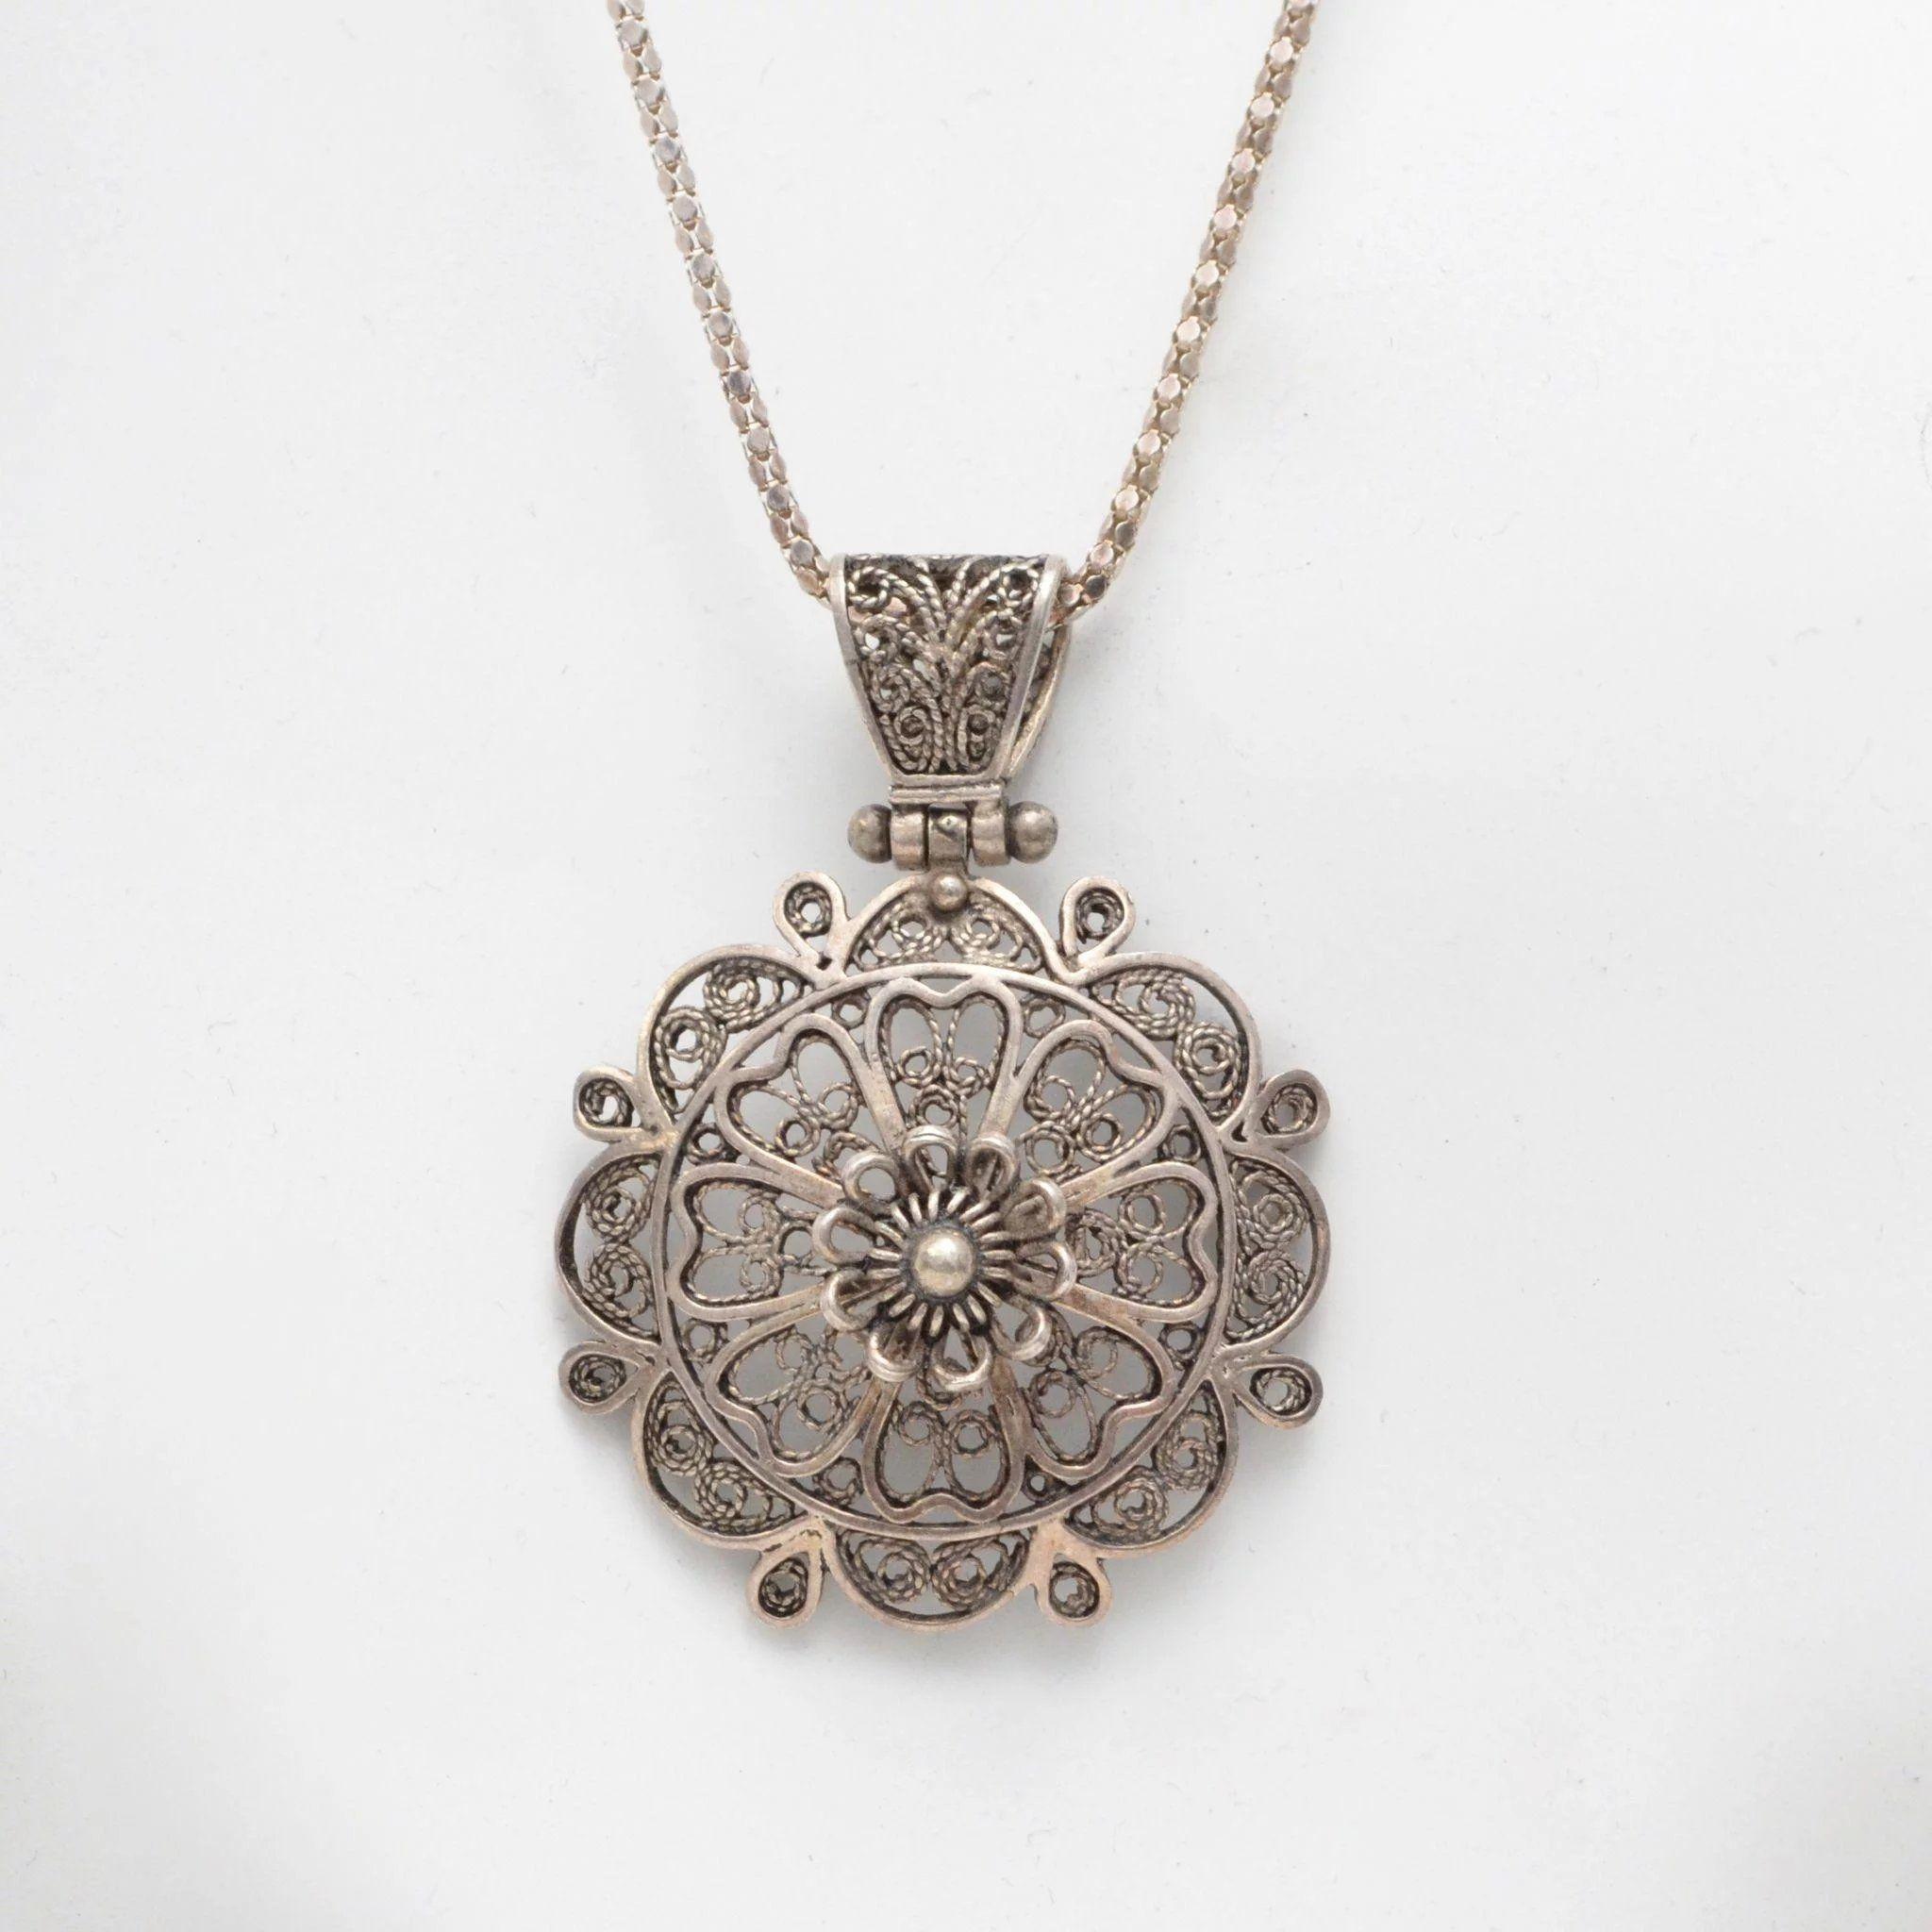 Sterling Silver Filigree Flower Pendant w/ Chain Black